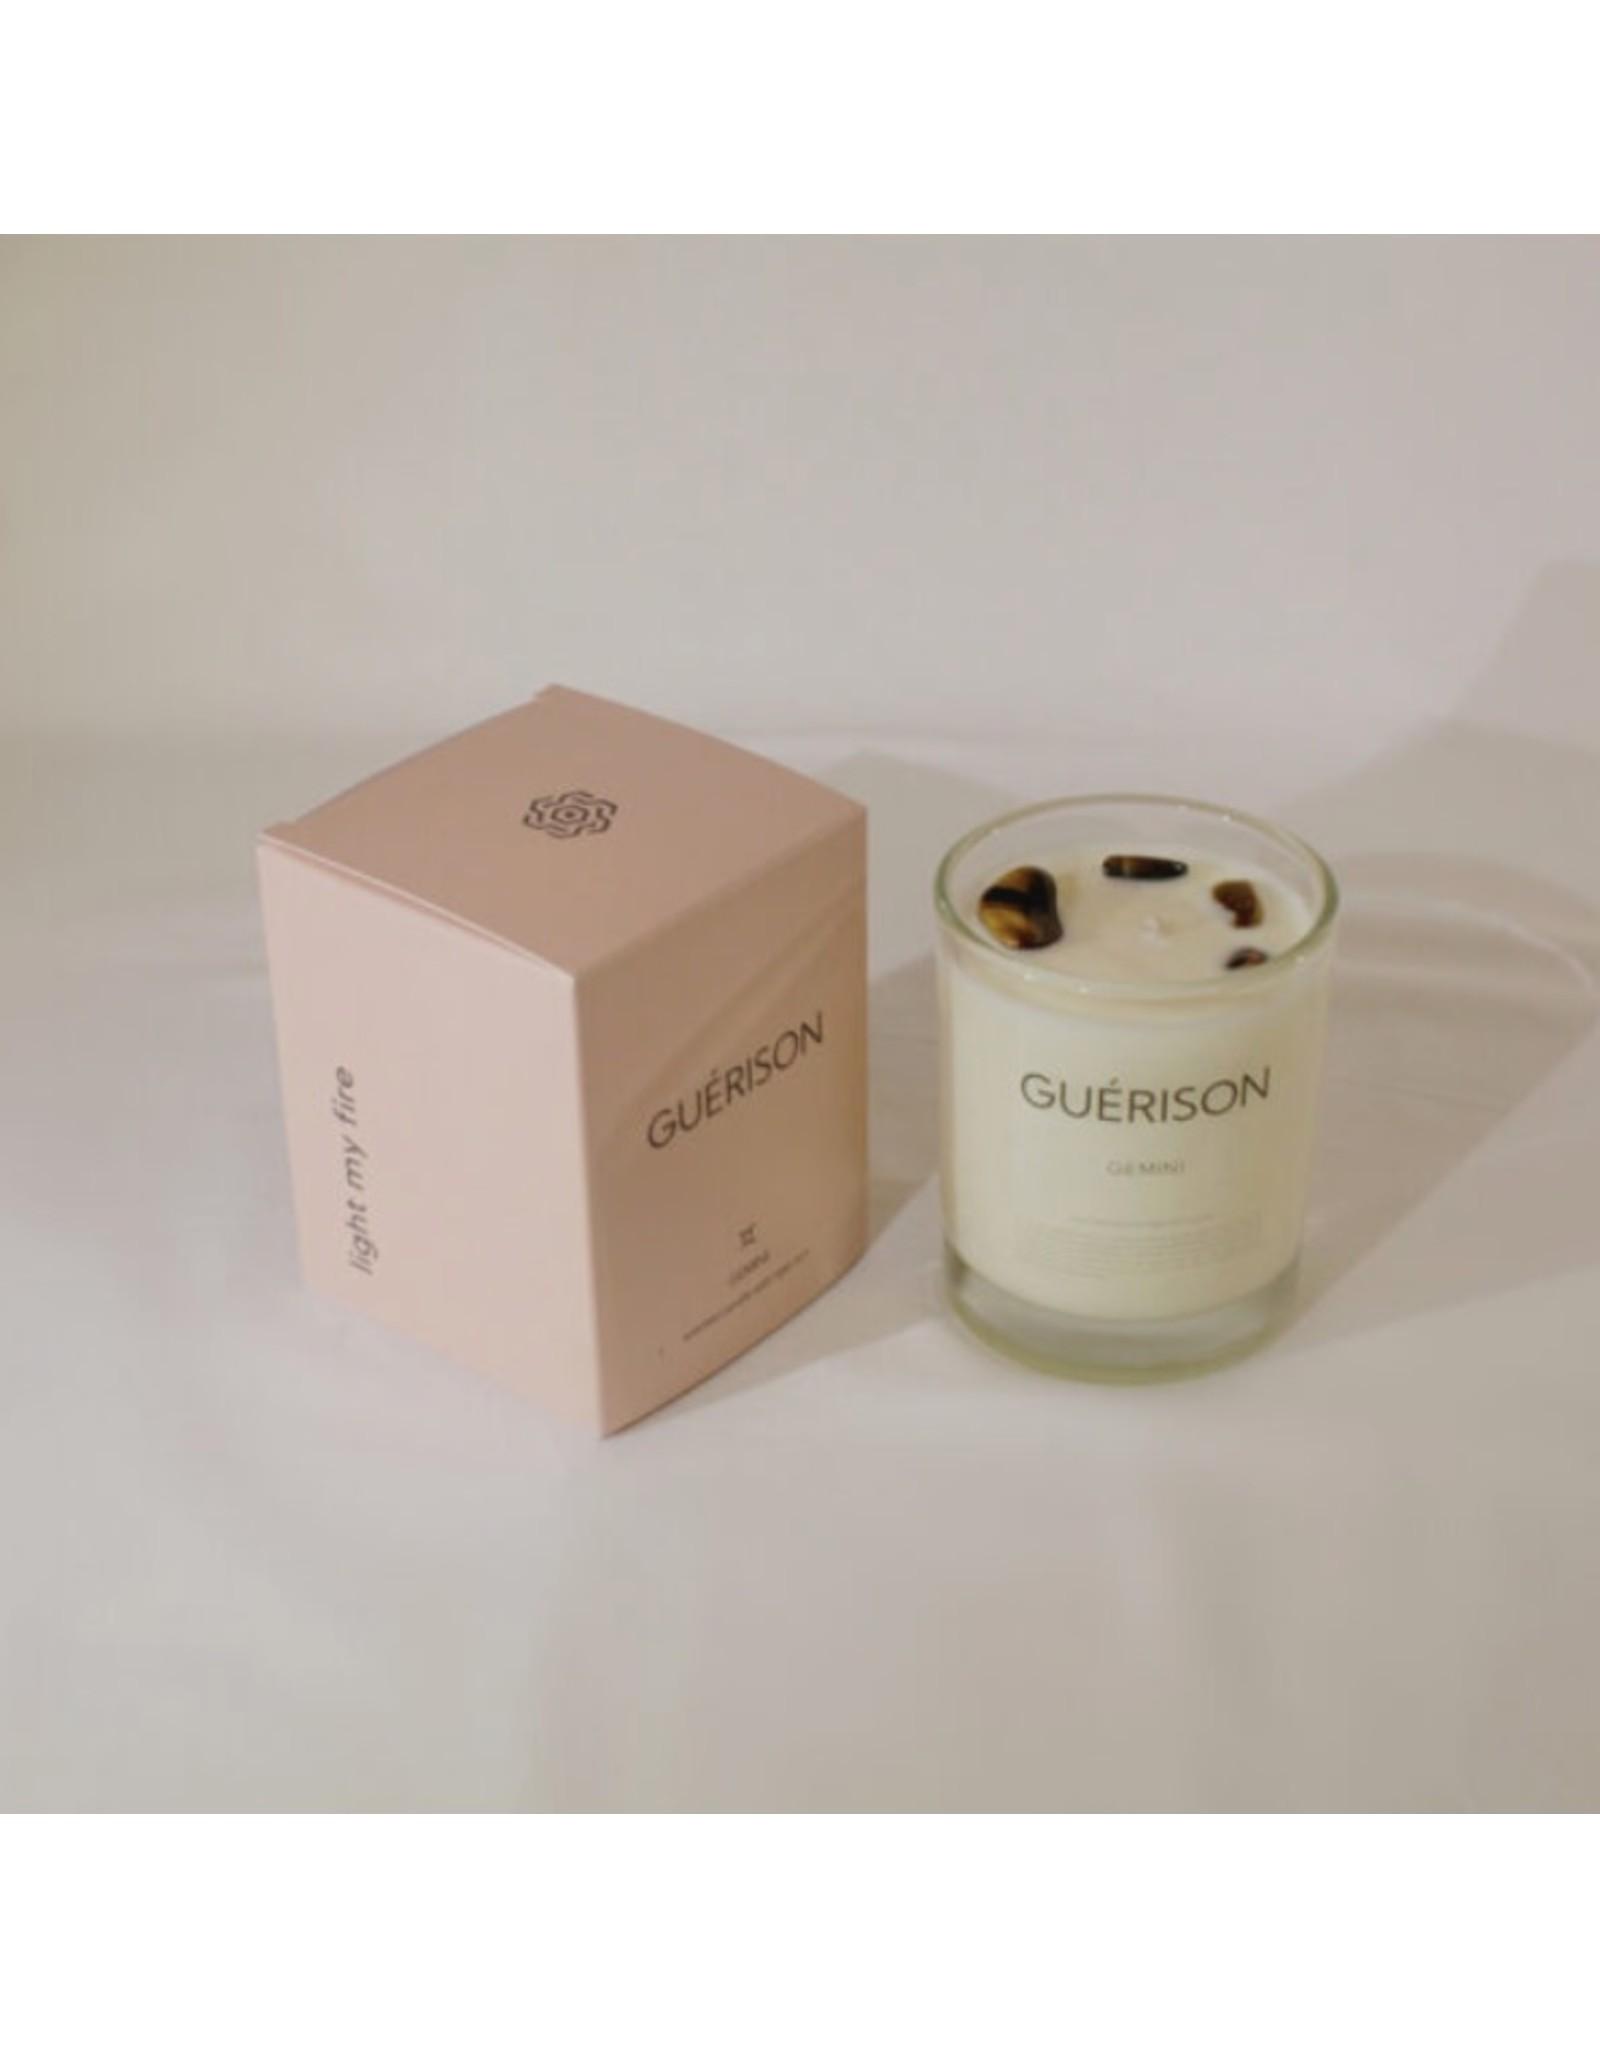 Guérison Gemini Candle, 220g